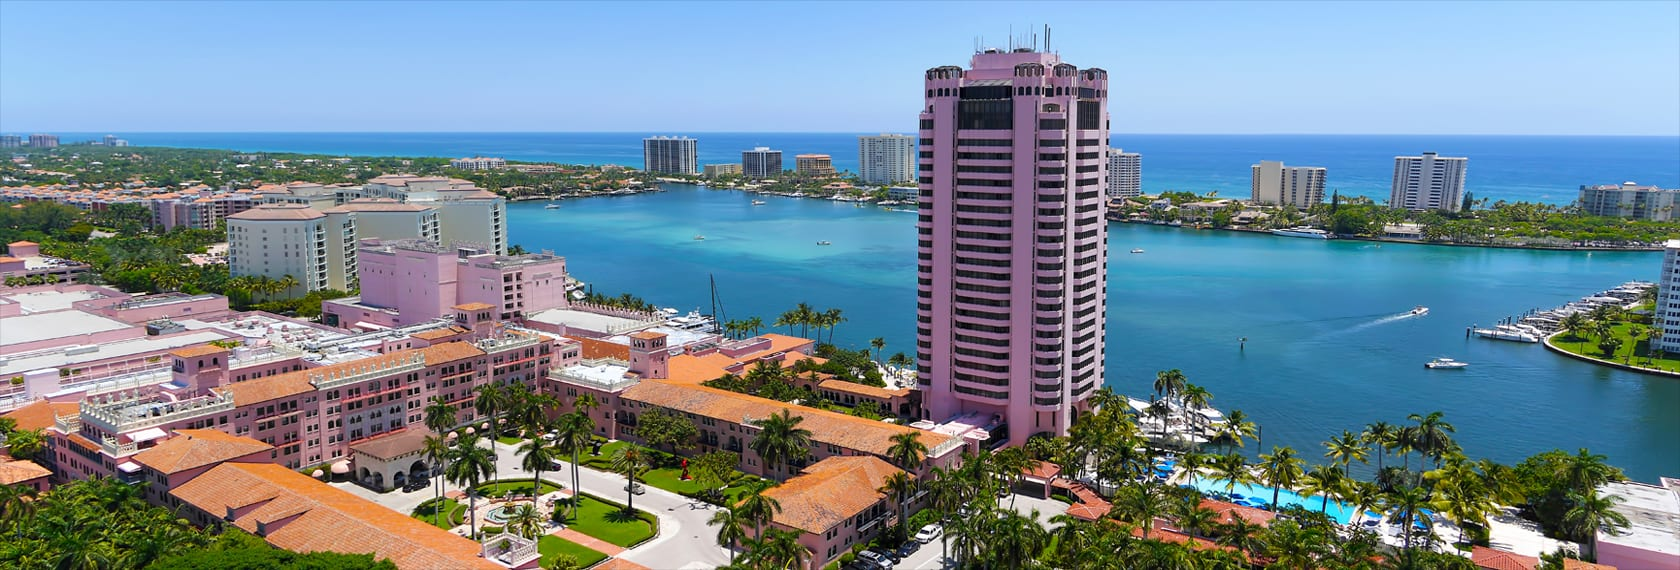 Boca Raton SEO Company